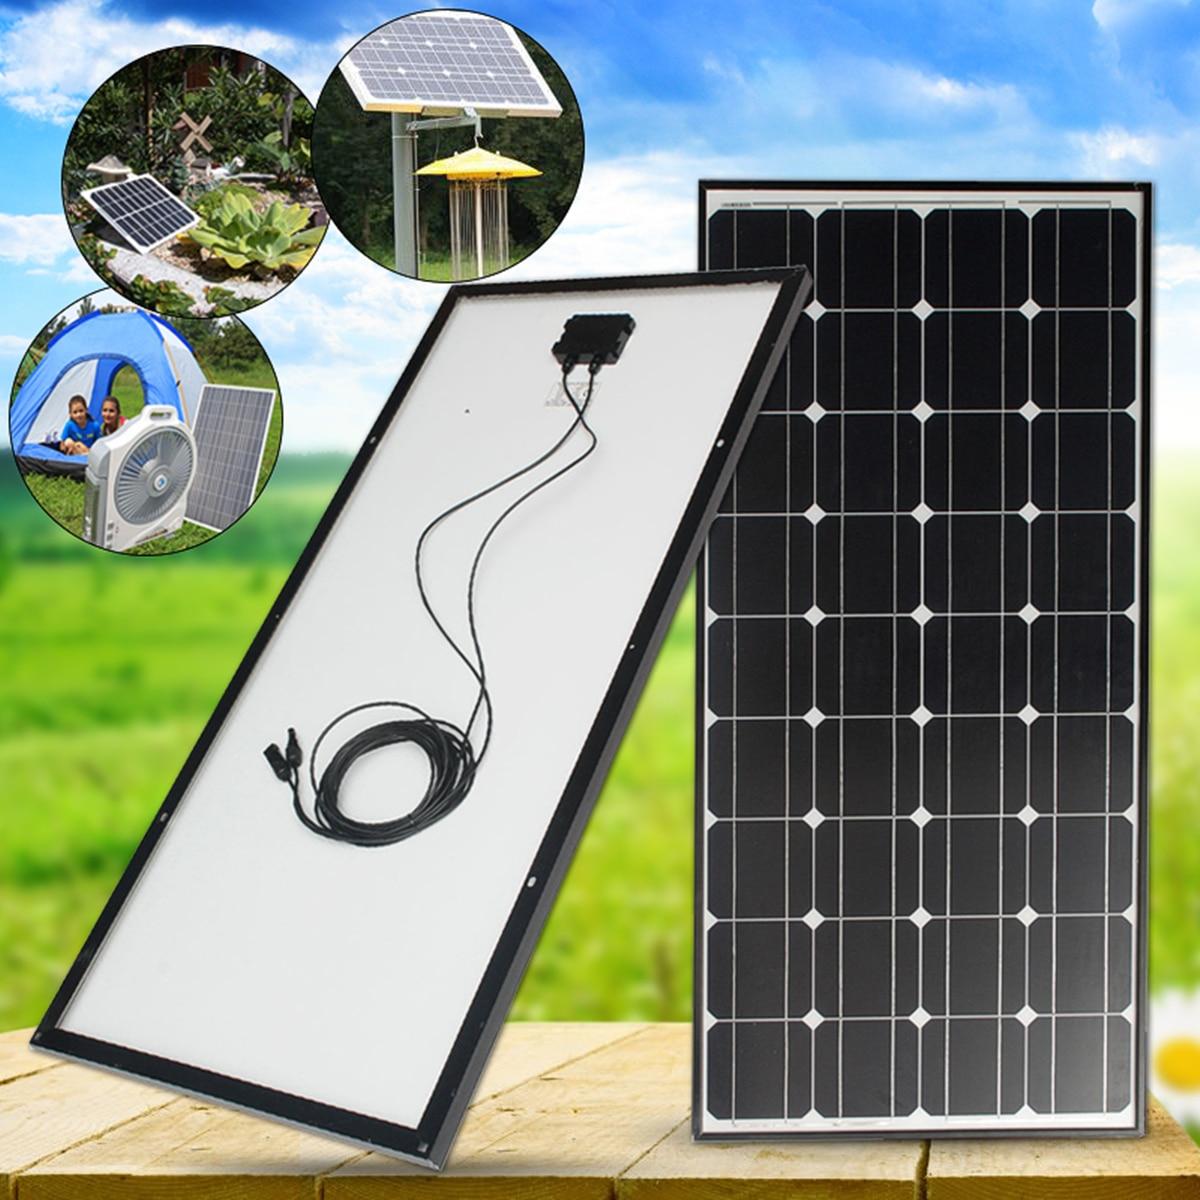 100W Solar Panel 18V 100W Solar Charger For Car Battery 12V Battery Charger Monocrystalline Cells Module Kit